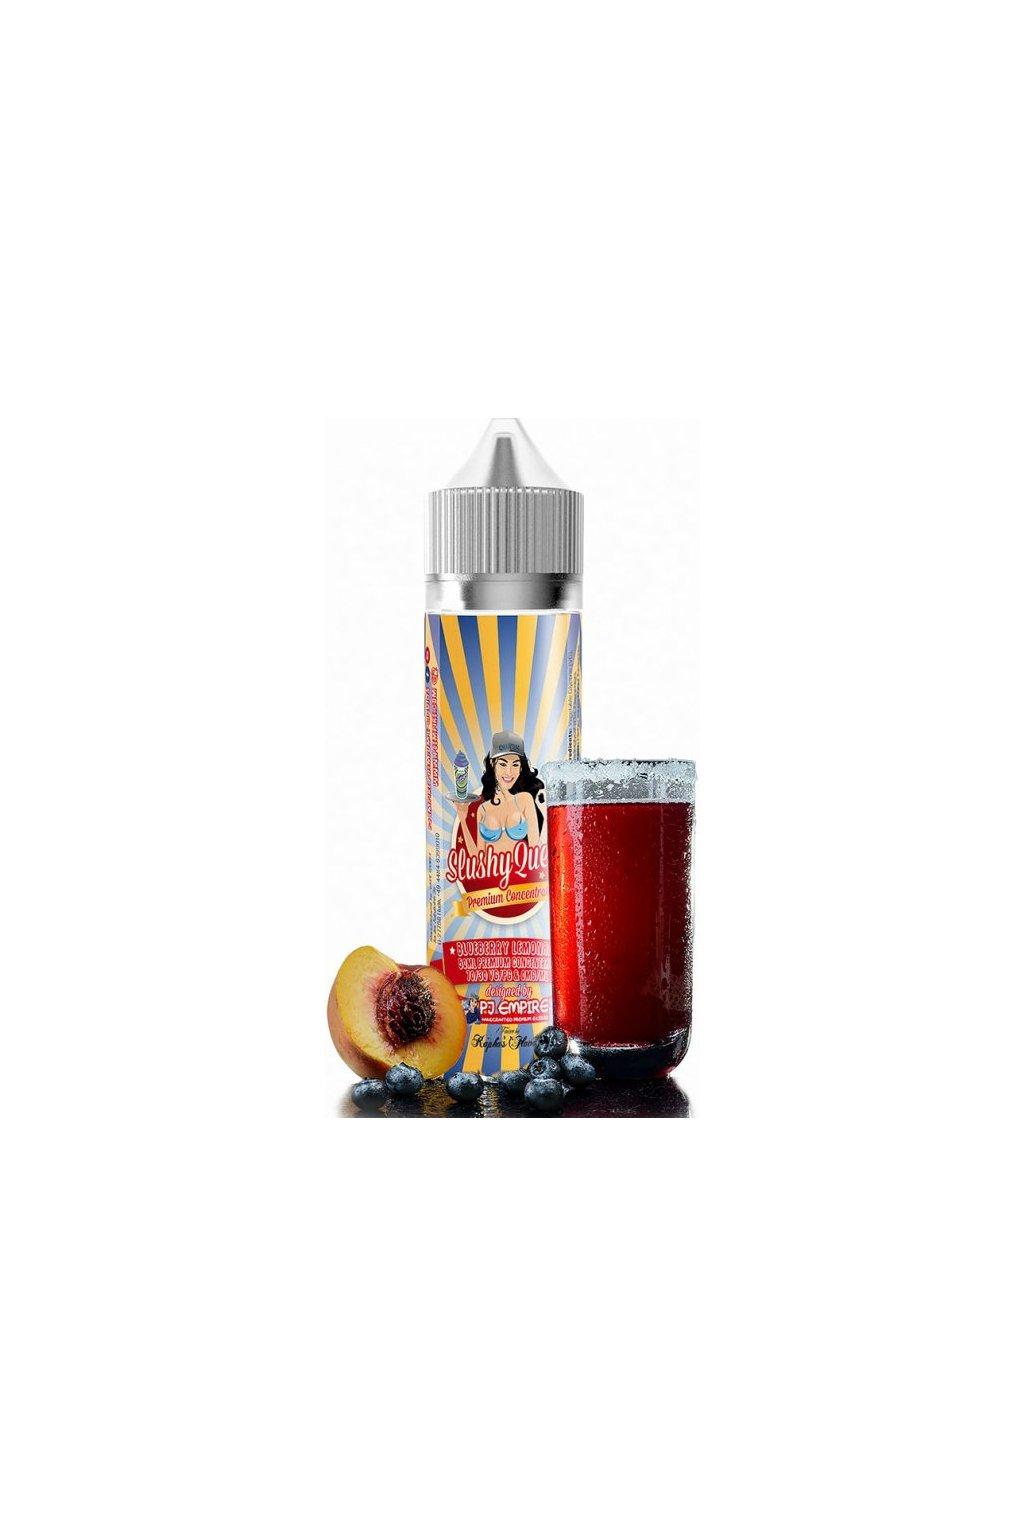 PJ Empire 12ml Slushy Queen Blueberry Lemonade